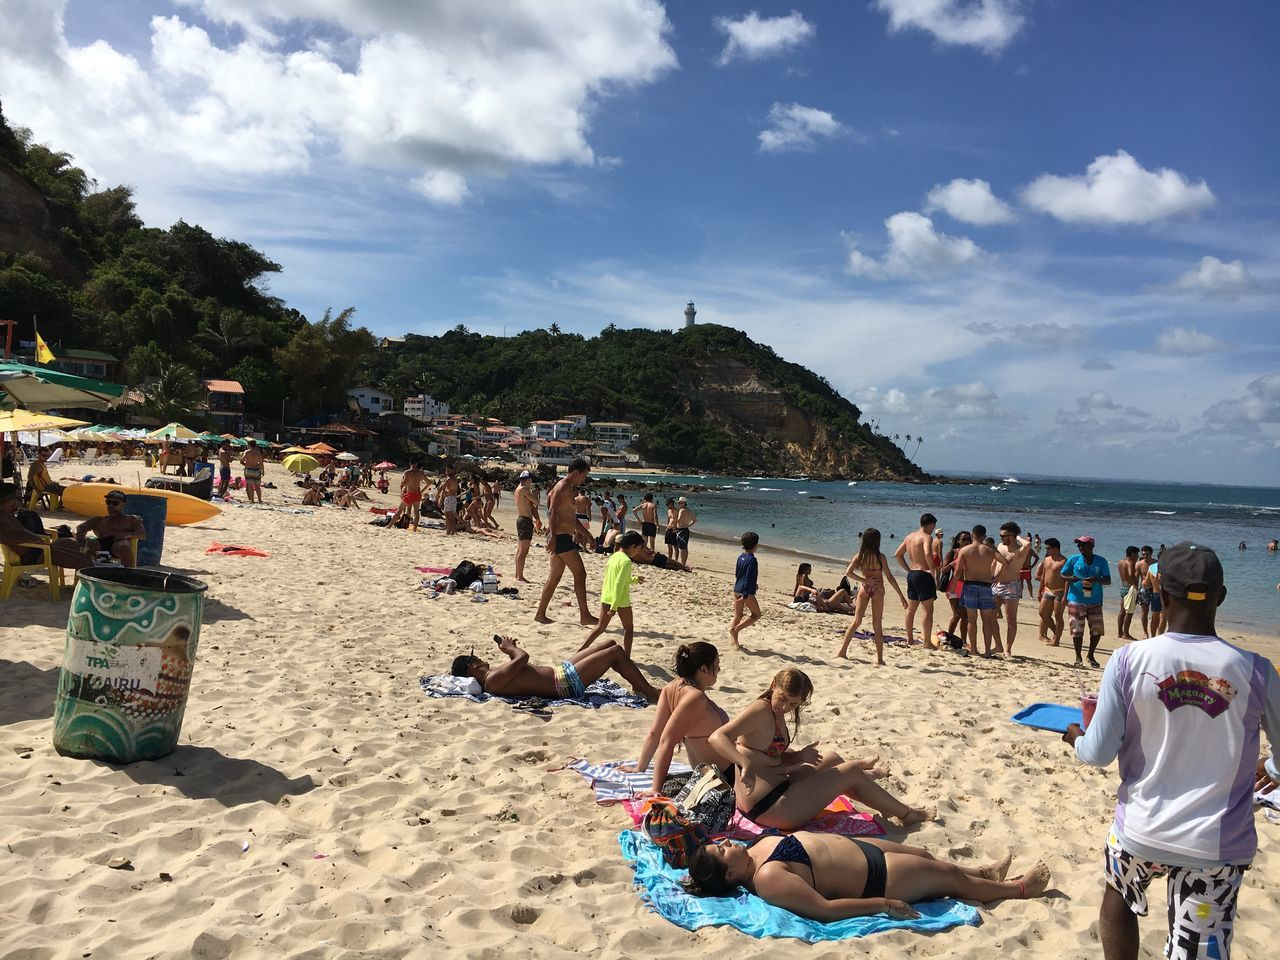 Beach Brazil Sea Lifestyles